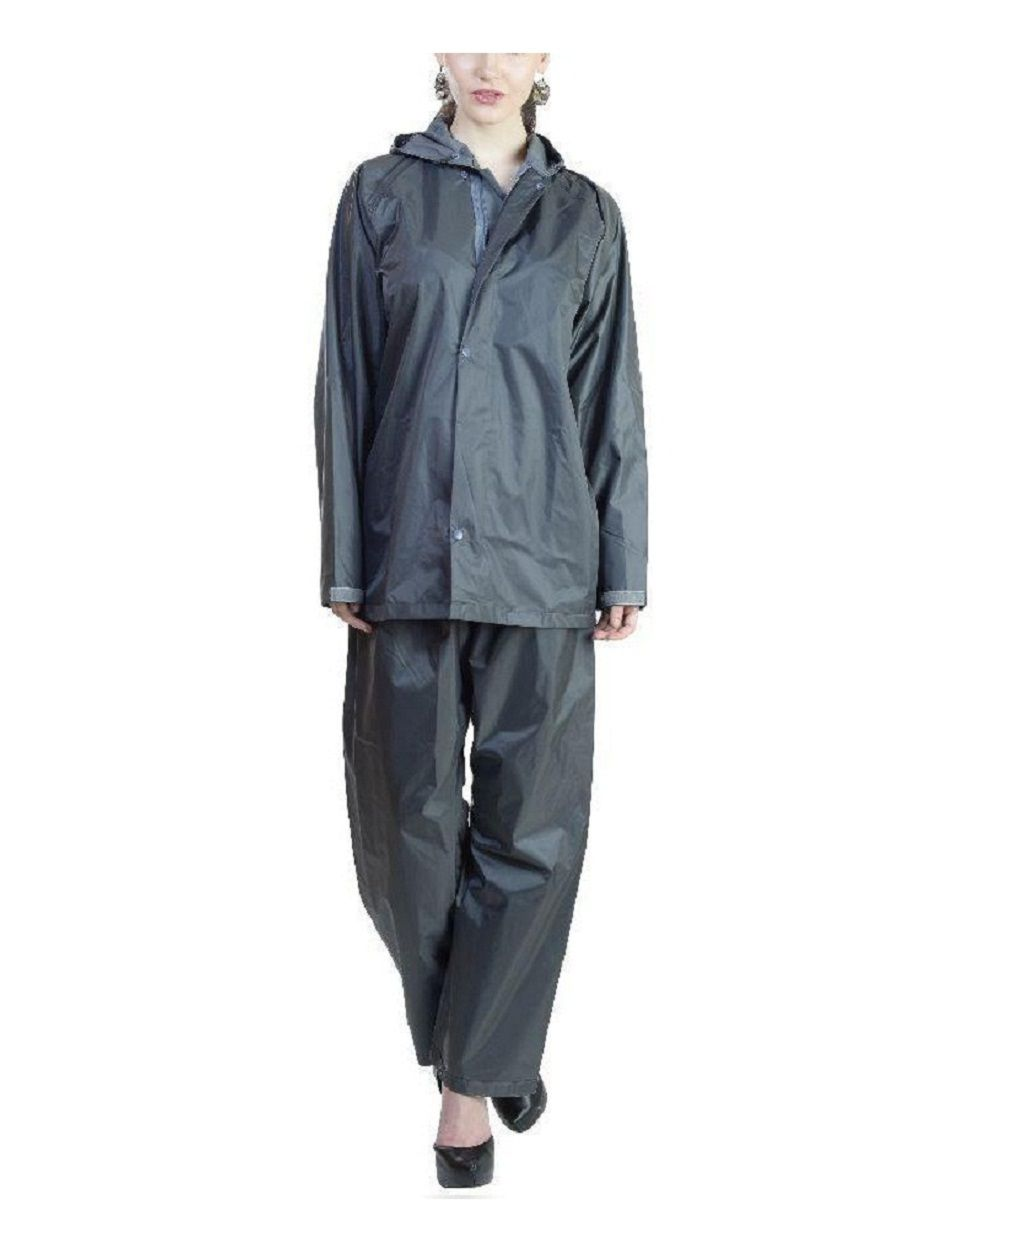 ZAINEE CLOTHING Nylon Raincoat Set - Black